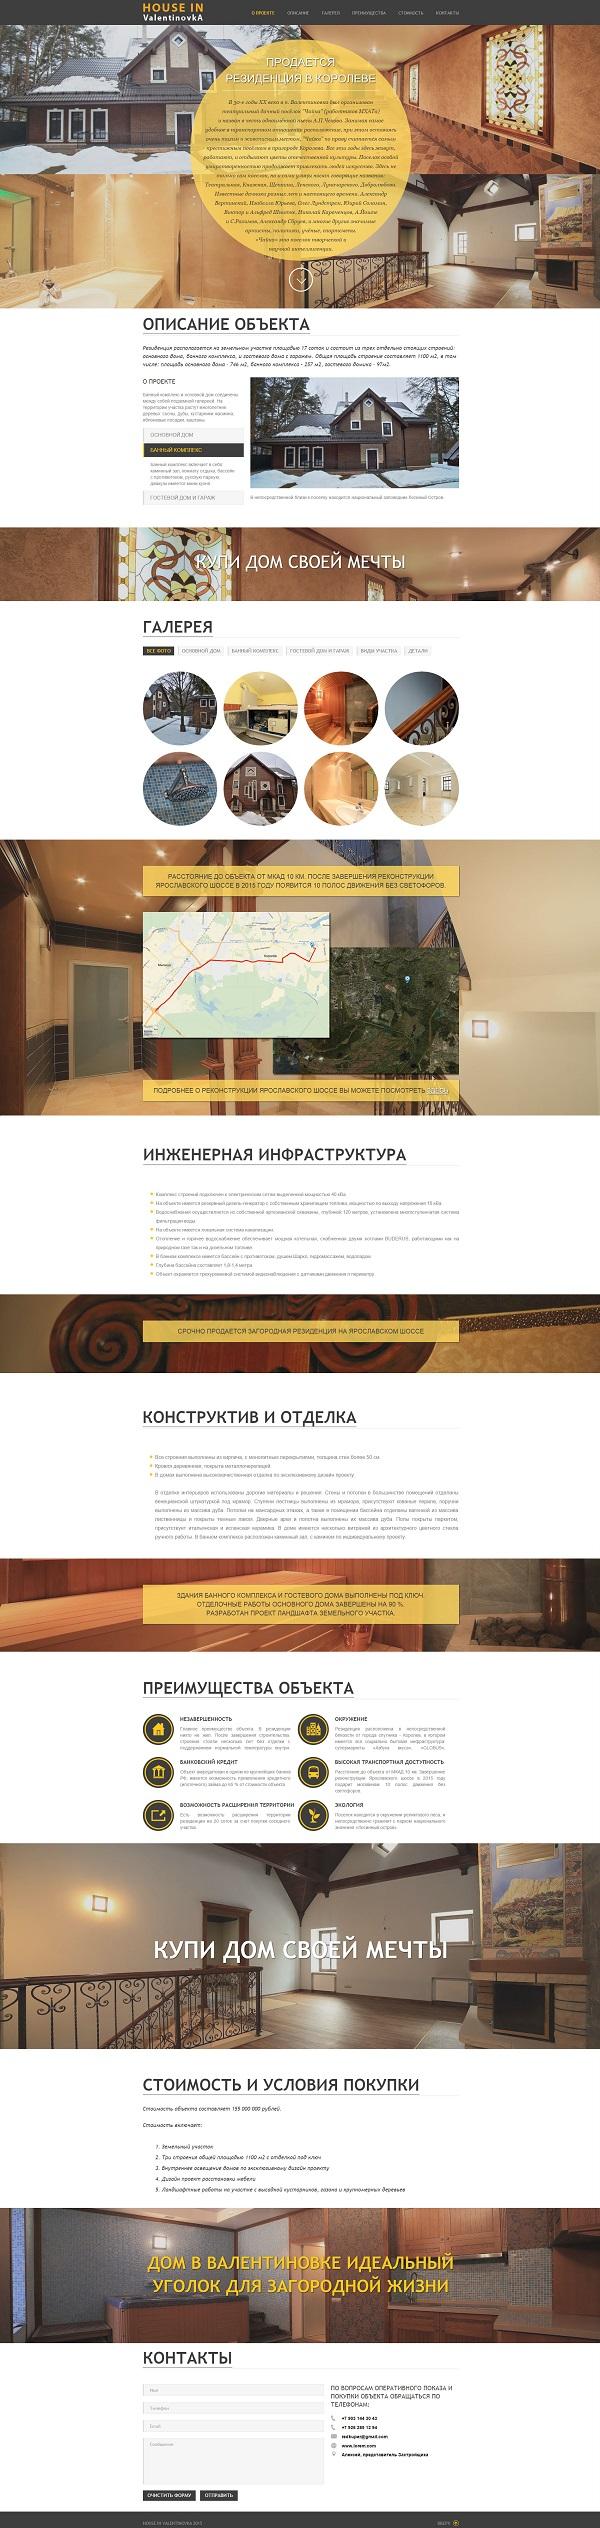 Сайт резиденции